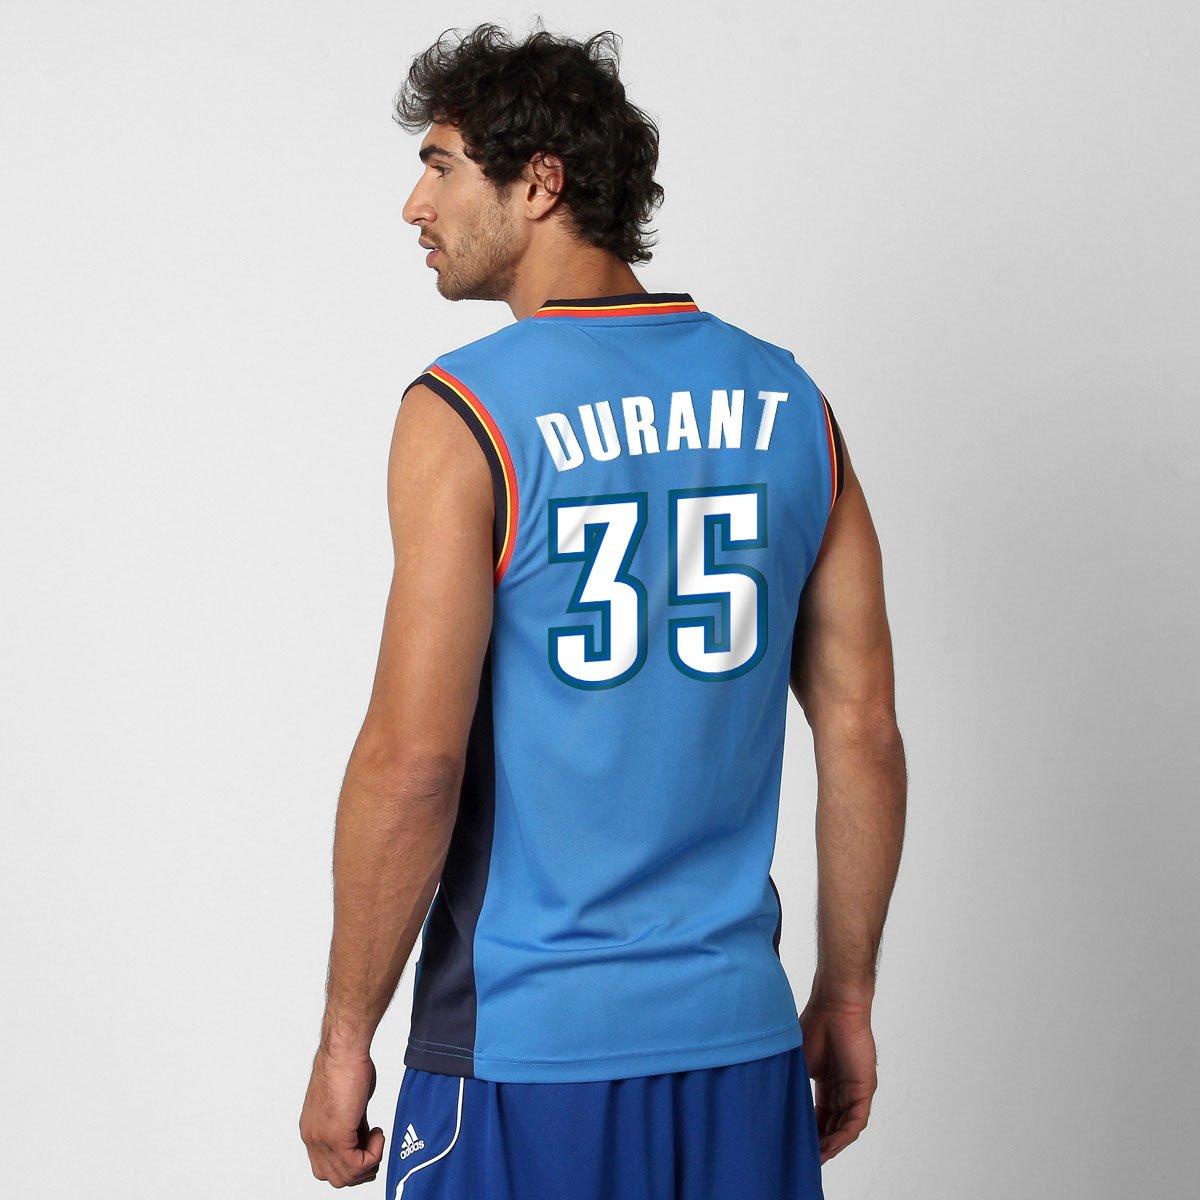 b1b40c91e Camiseta Regata Adidas Oklahoma City Thunder Road nº 35 - Kevin Durant -  Compre Agora